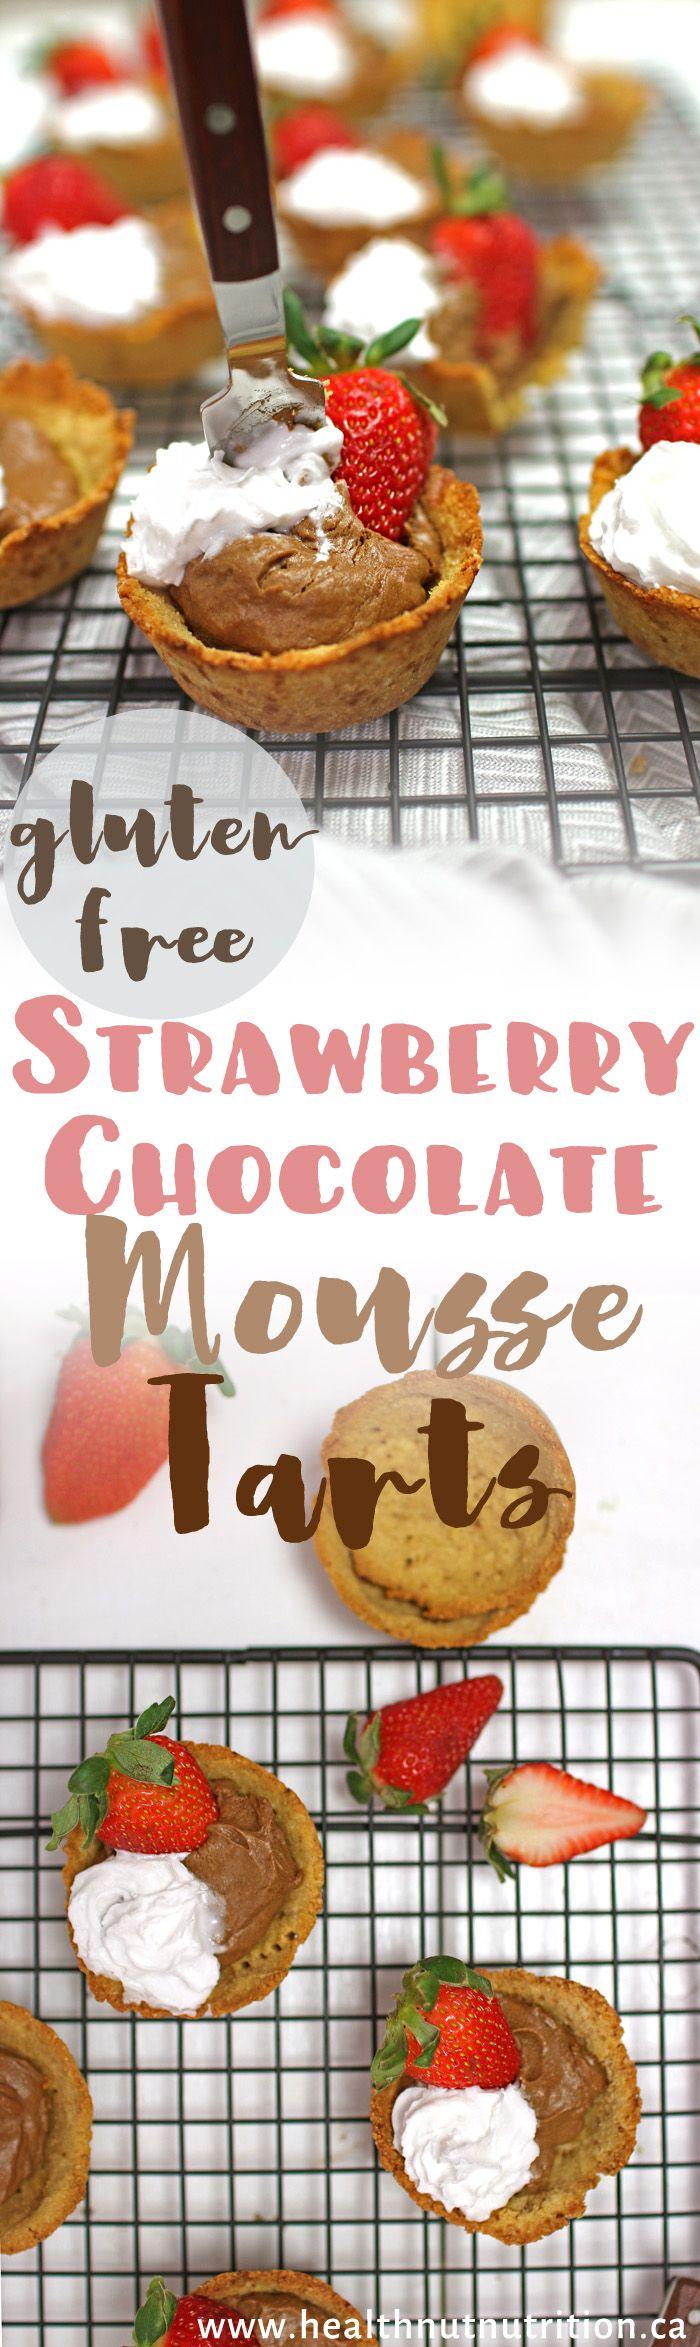 Strawberry Chocolate Mousse Tarts